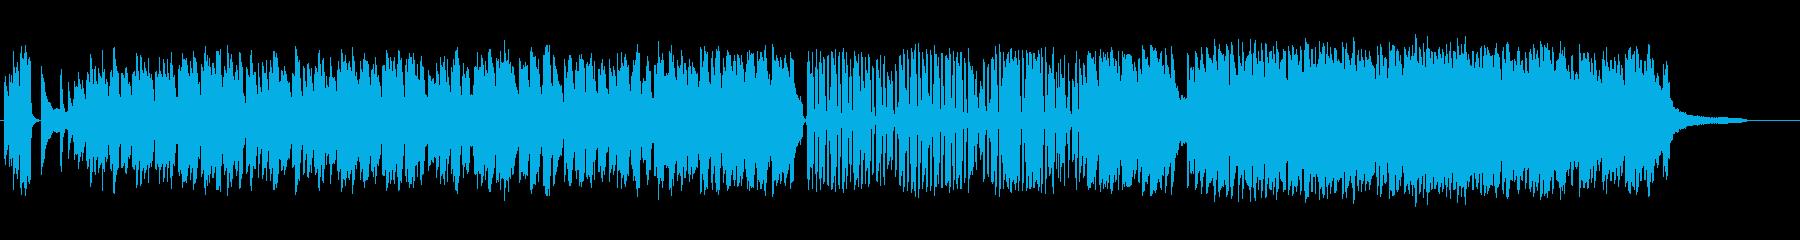 Uma Kage danceの再生済みの波形